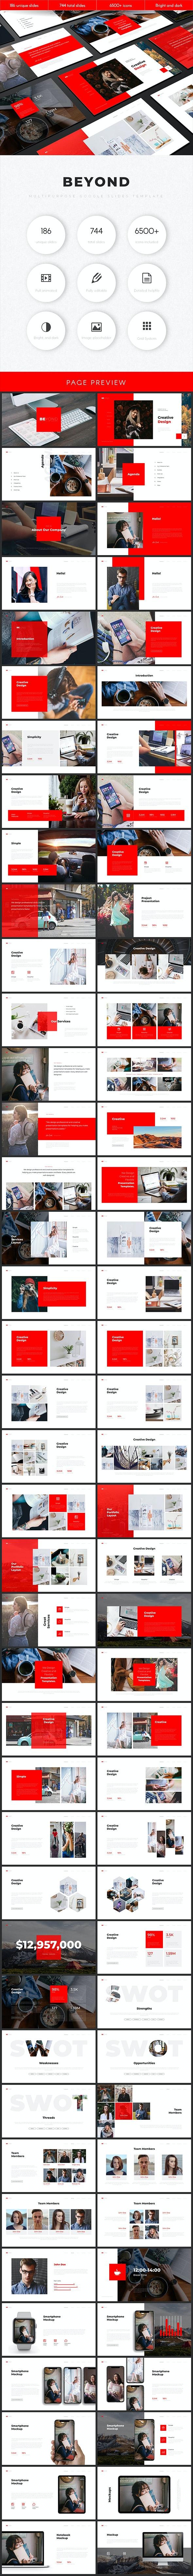 Beyond Multipurpose Google Slides Template - Google Slides Presentation Templates